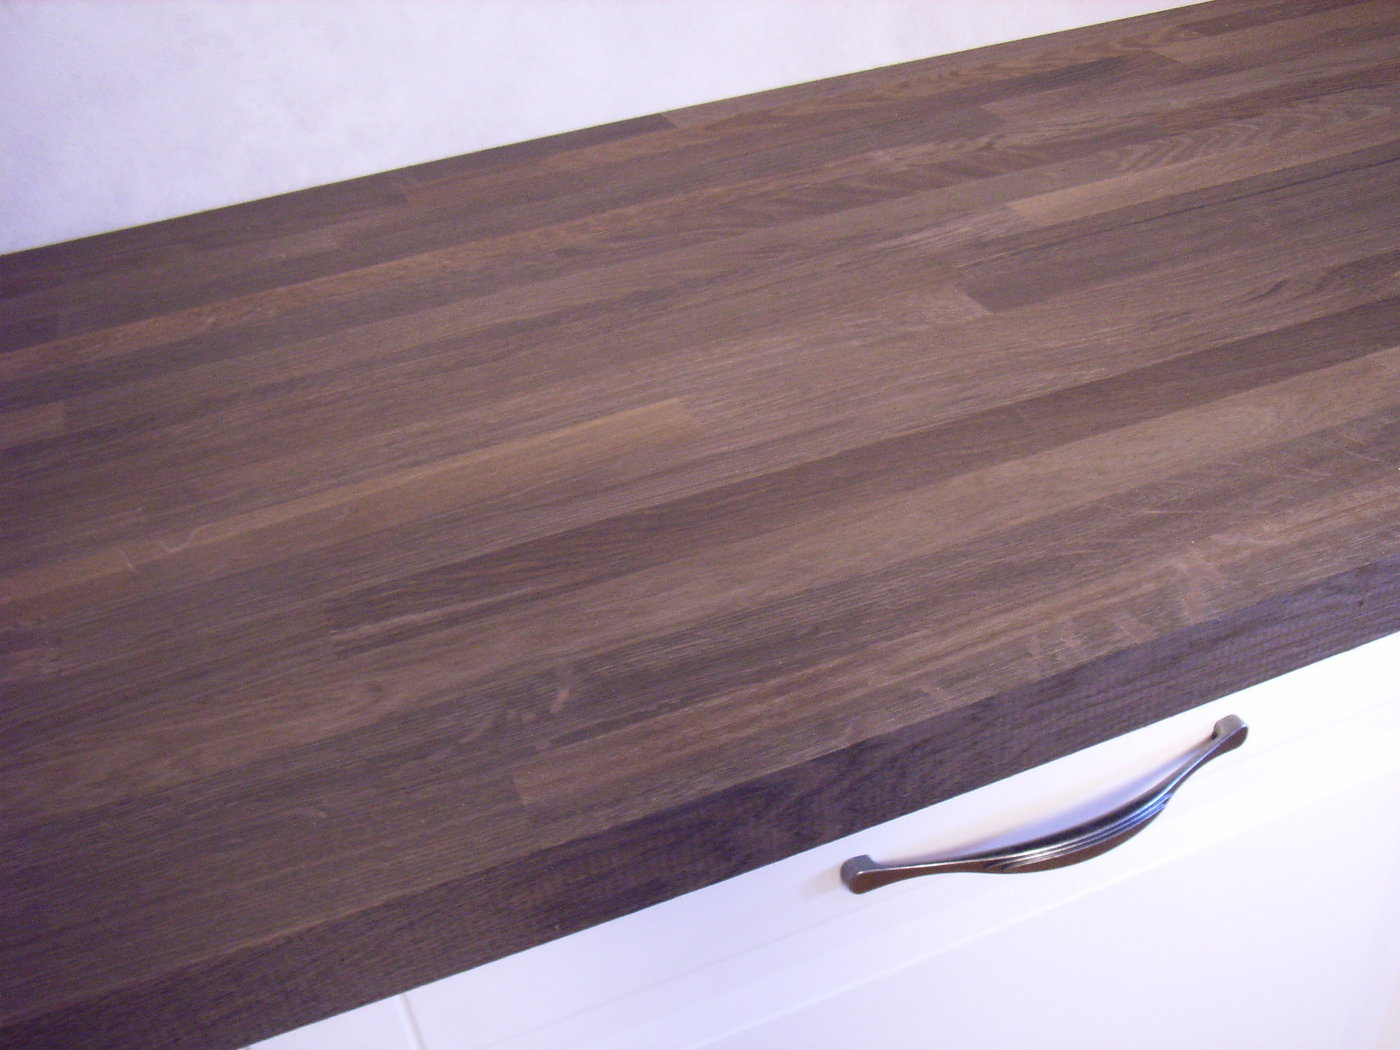 arbeitsplatte k chenarbeitsplatte massivholz r uchereiche 40 4100 650. Black Bedroom Furniture Sets. Home Design Ideas